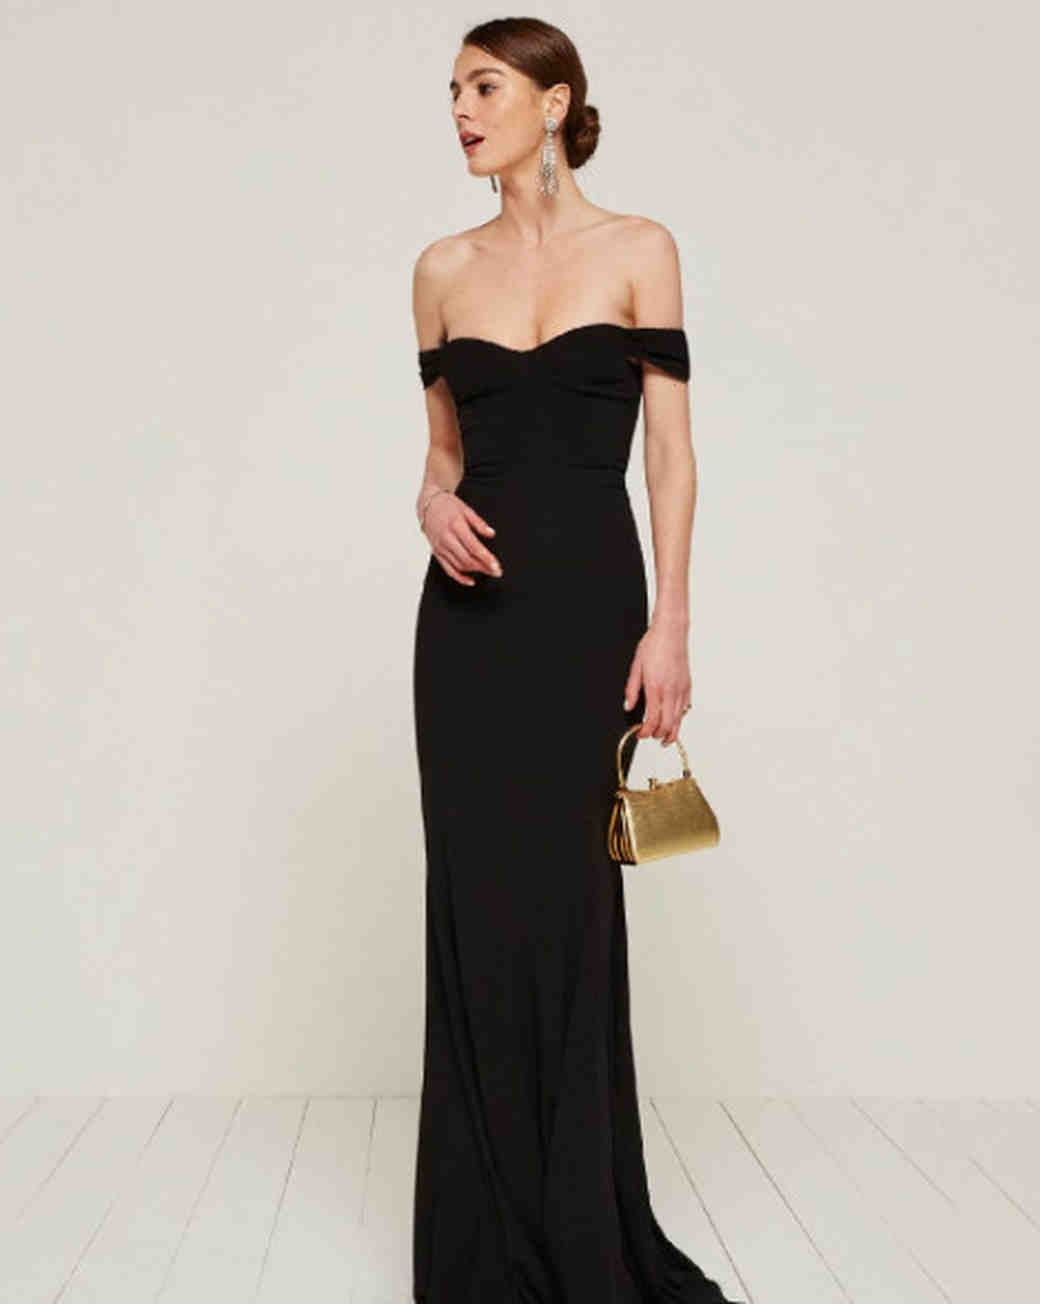 Superb 36 Beautiful Dresses To Wear As A Wedding Guest This Fall | Martha Stewart  Weddings